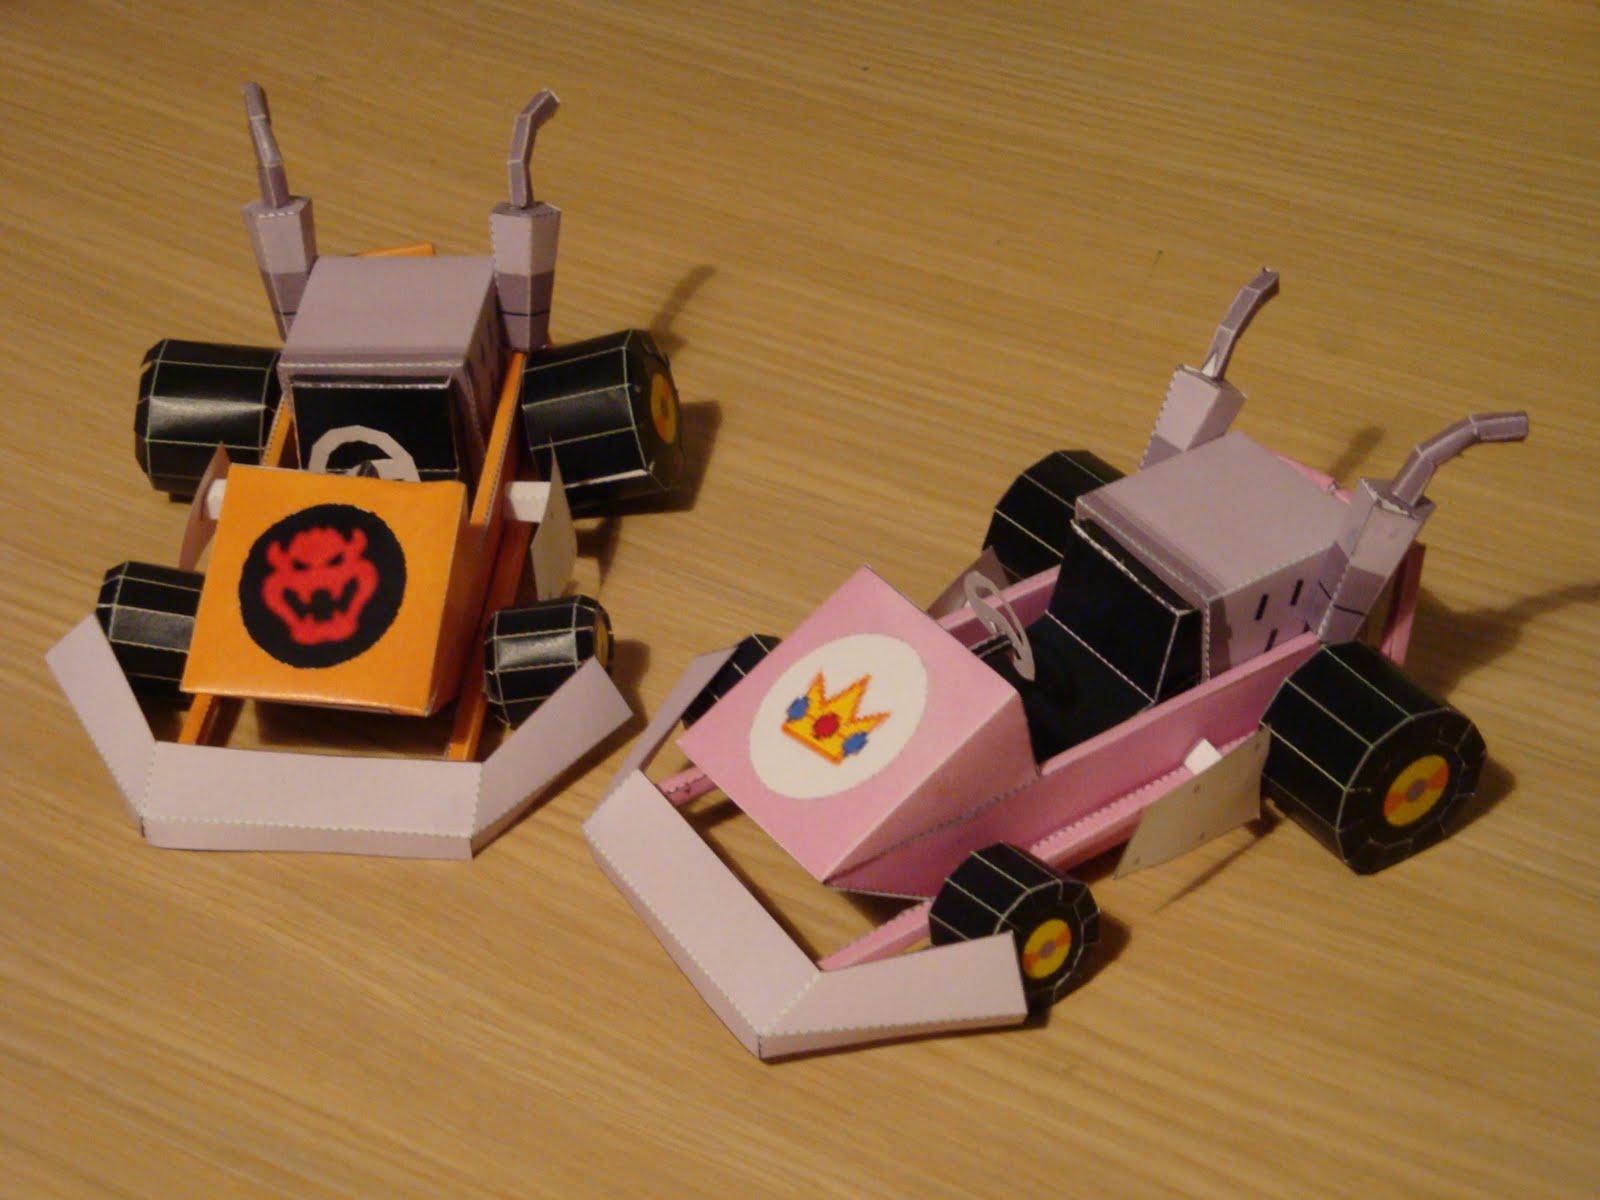 Mario Kart Papercraft: Bowser And Peach Kart | Papercraft ... - photo#21